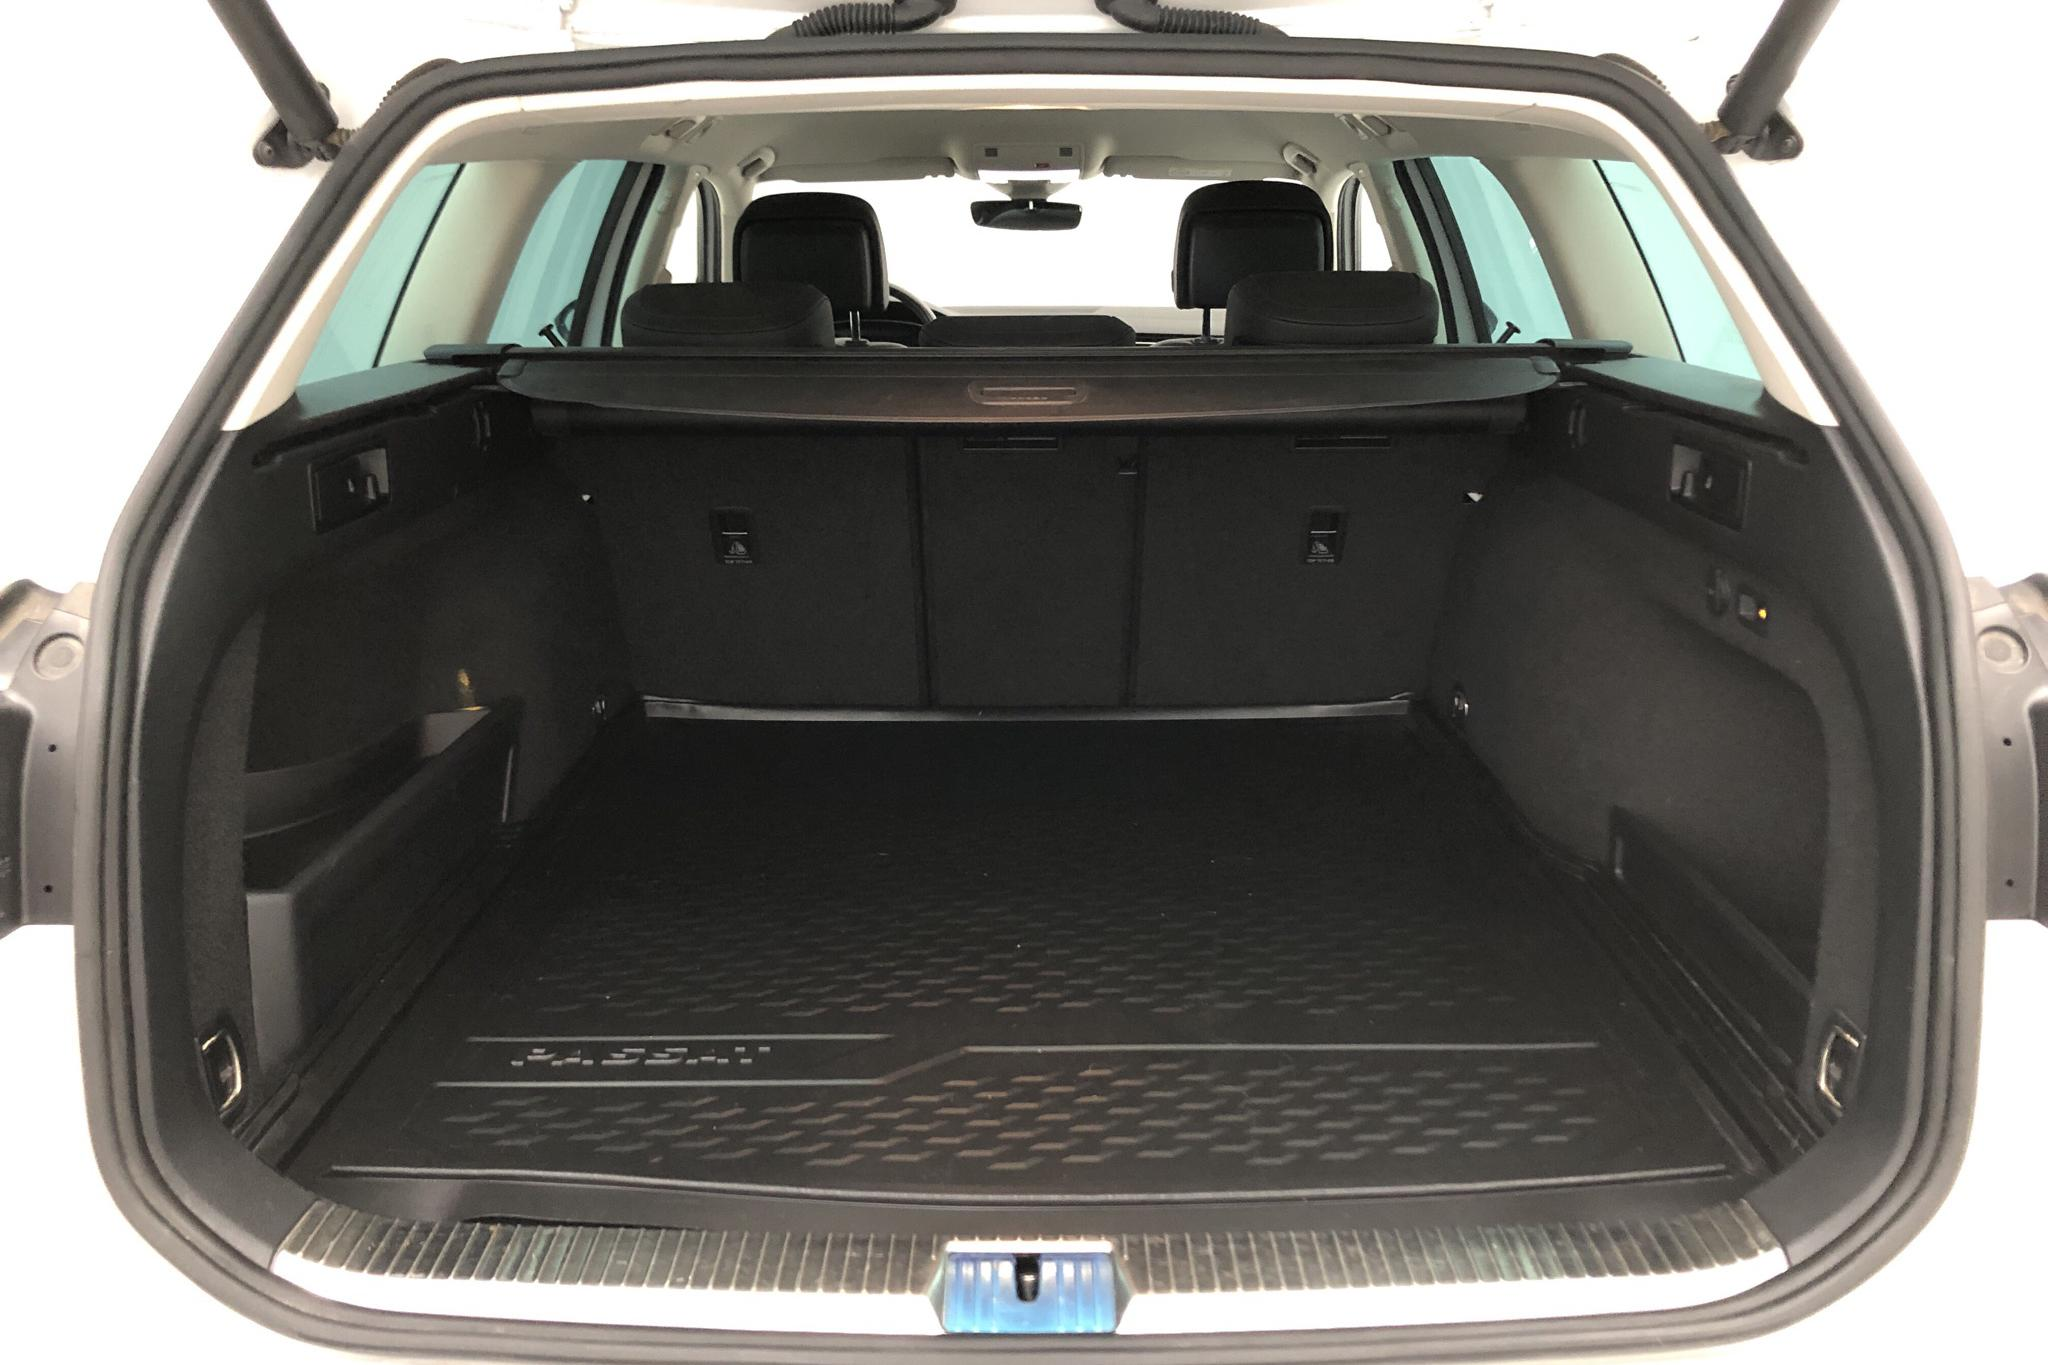 VW Passat 1.4 Plug-in-Hybrid Sportscombi (218hk) - 2 421 mil - Automat - vit - 2018